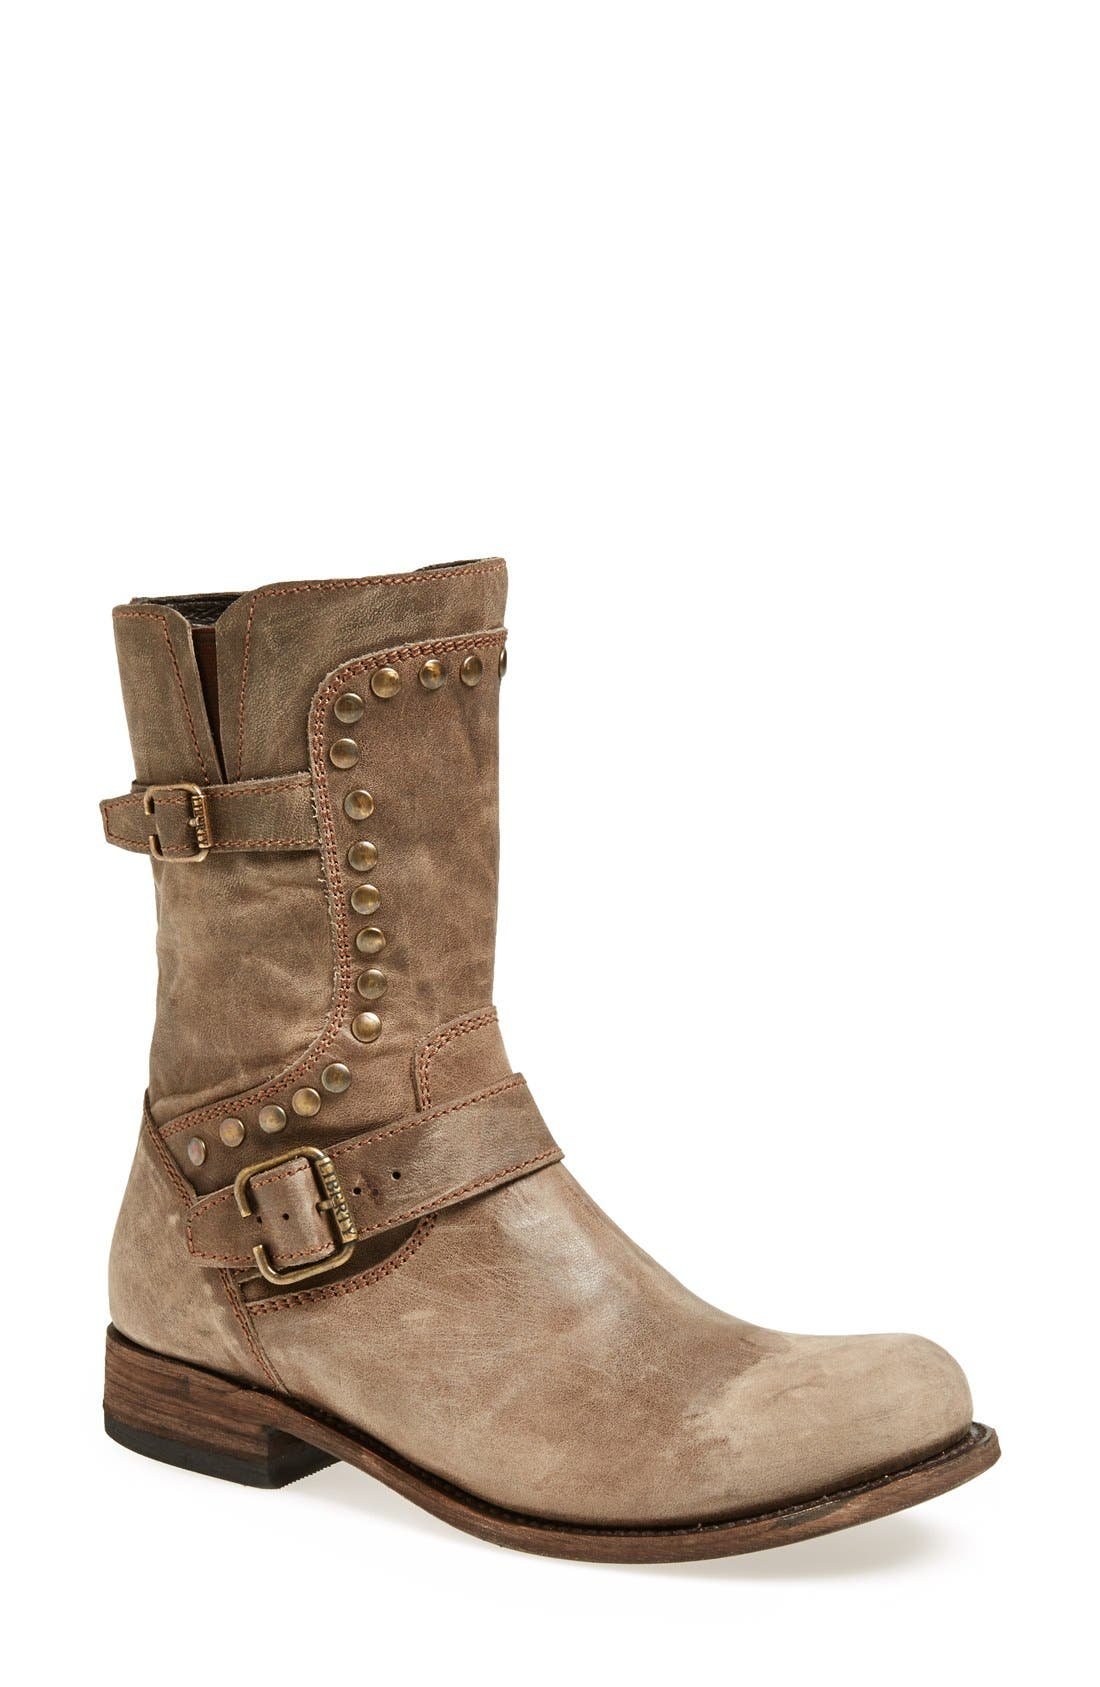 Alternate Image 1 Selected - Liberty Black 'El Paso' Studded Boot (Women)